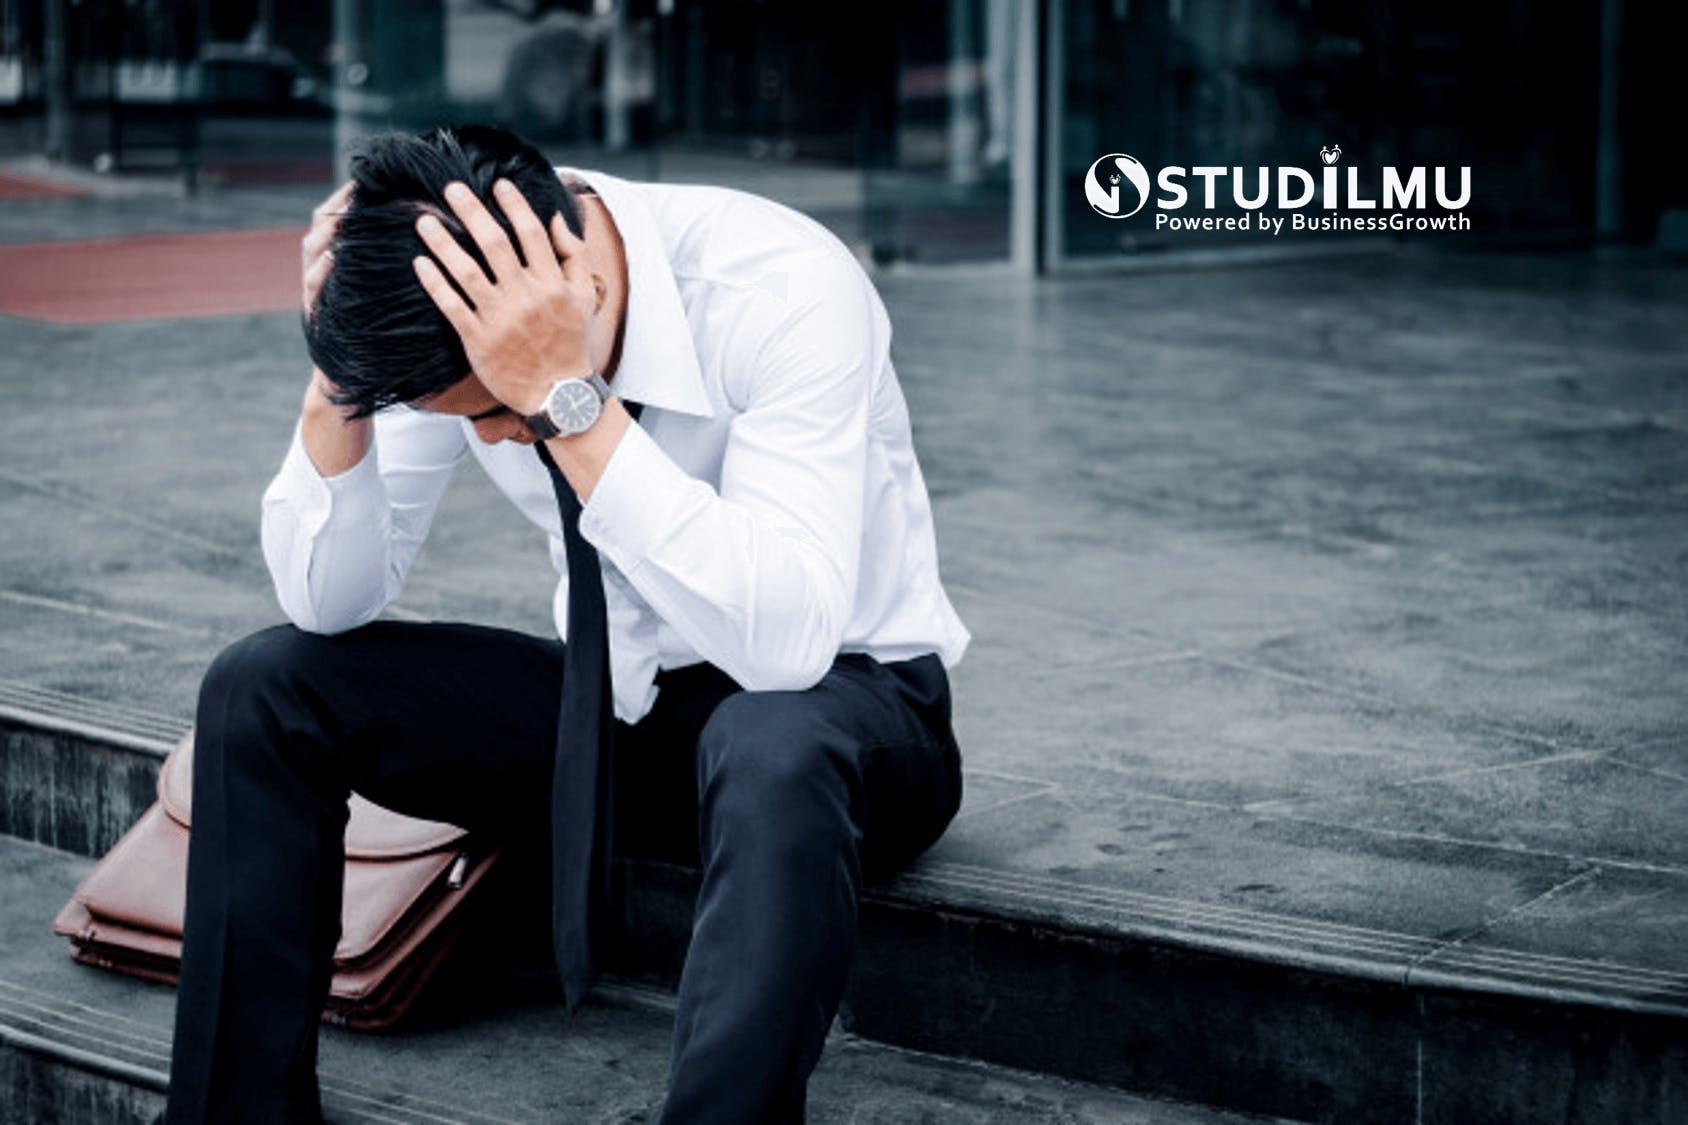 STUDILMU Career Advice - 10 Cara Ampuh Mengatasi Stres